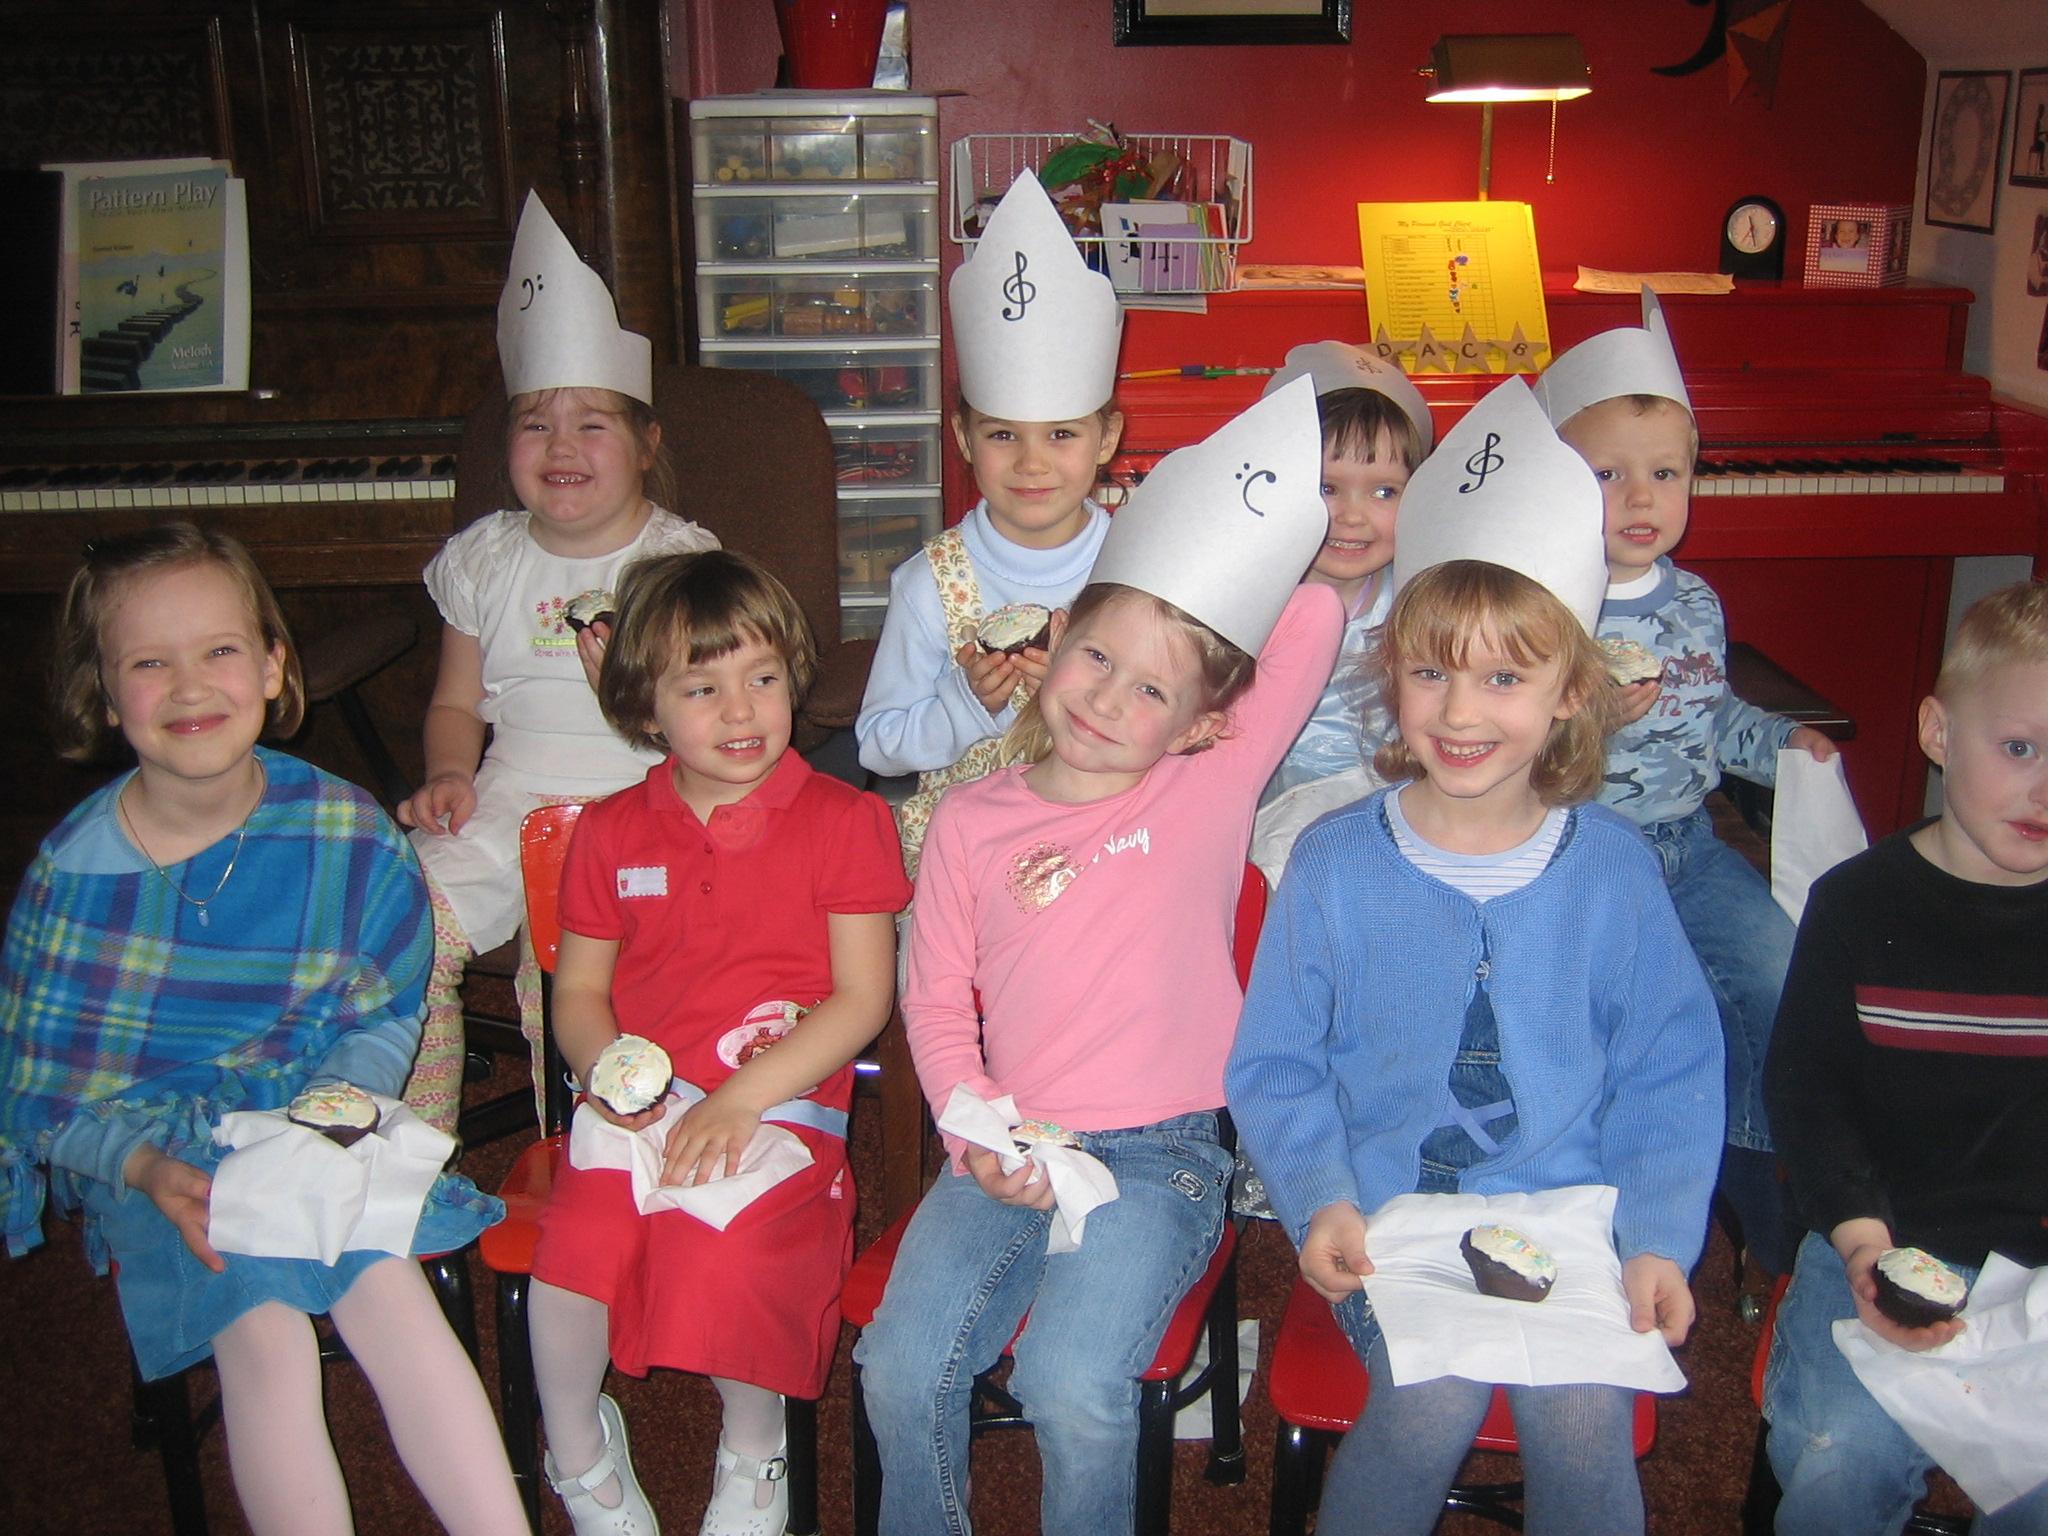 Joani Steck - Students